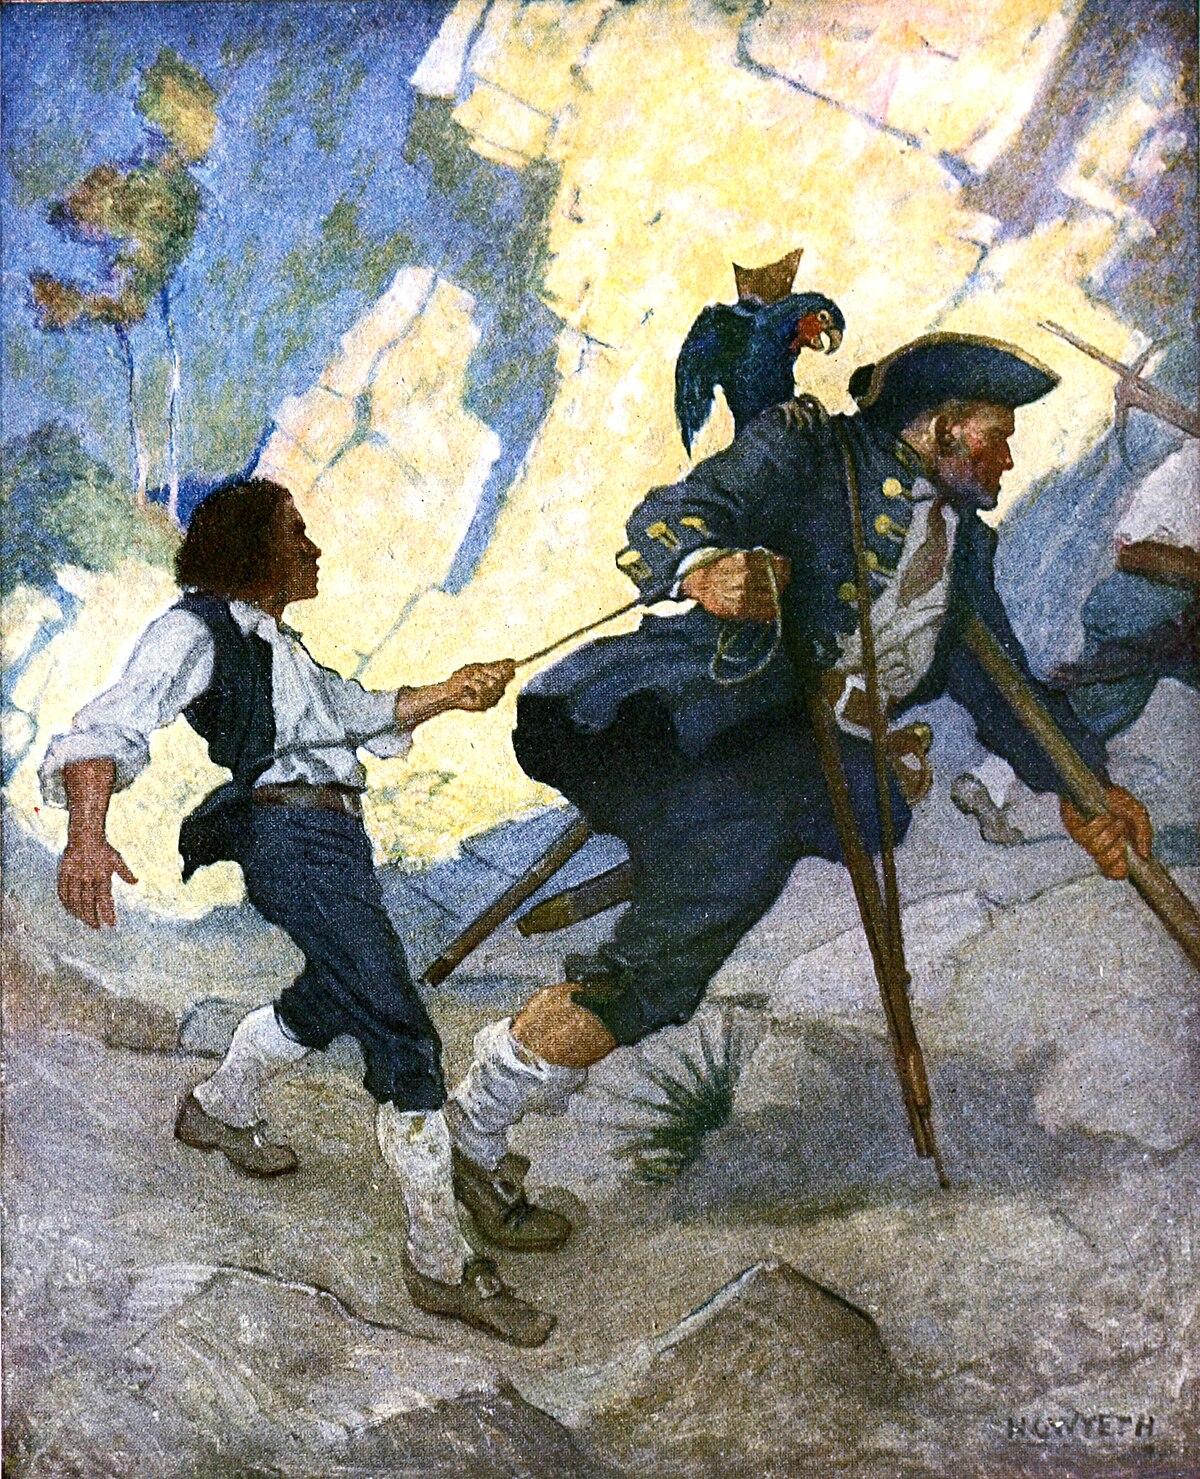 Long John Silver - Wikipedia